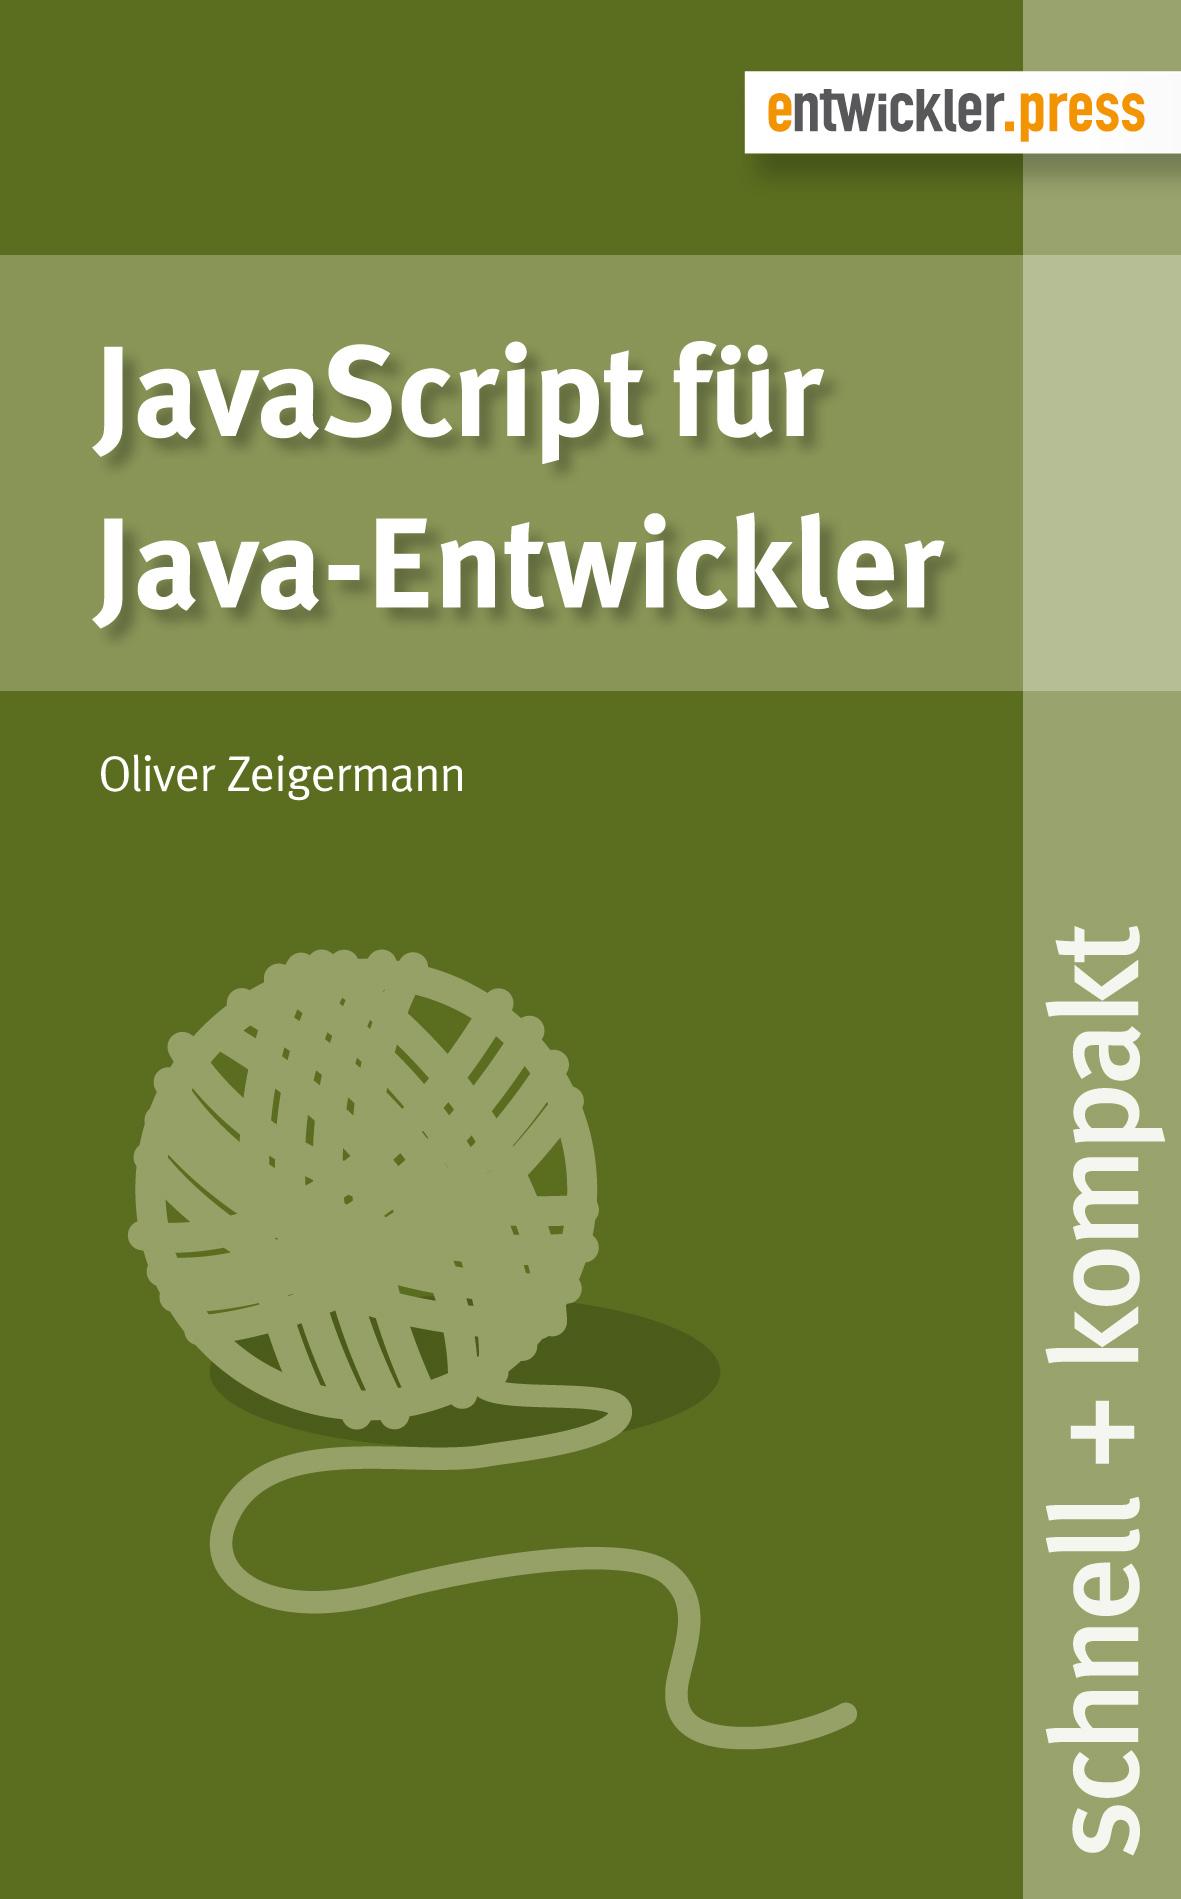 entwicklerpress_javascript.tif_fmt1.jpg